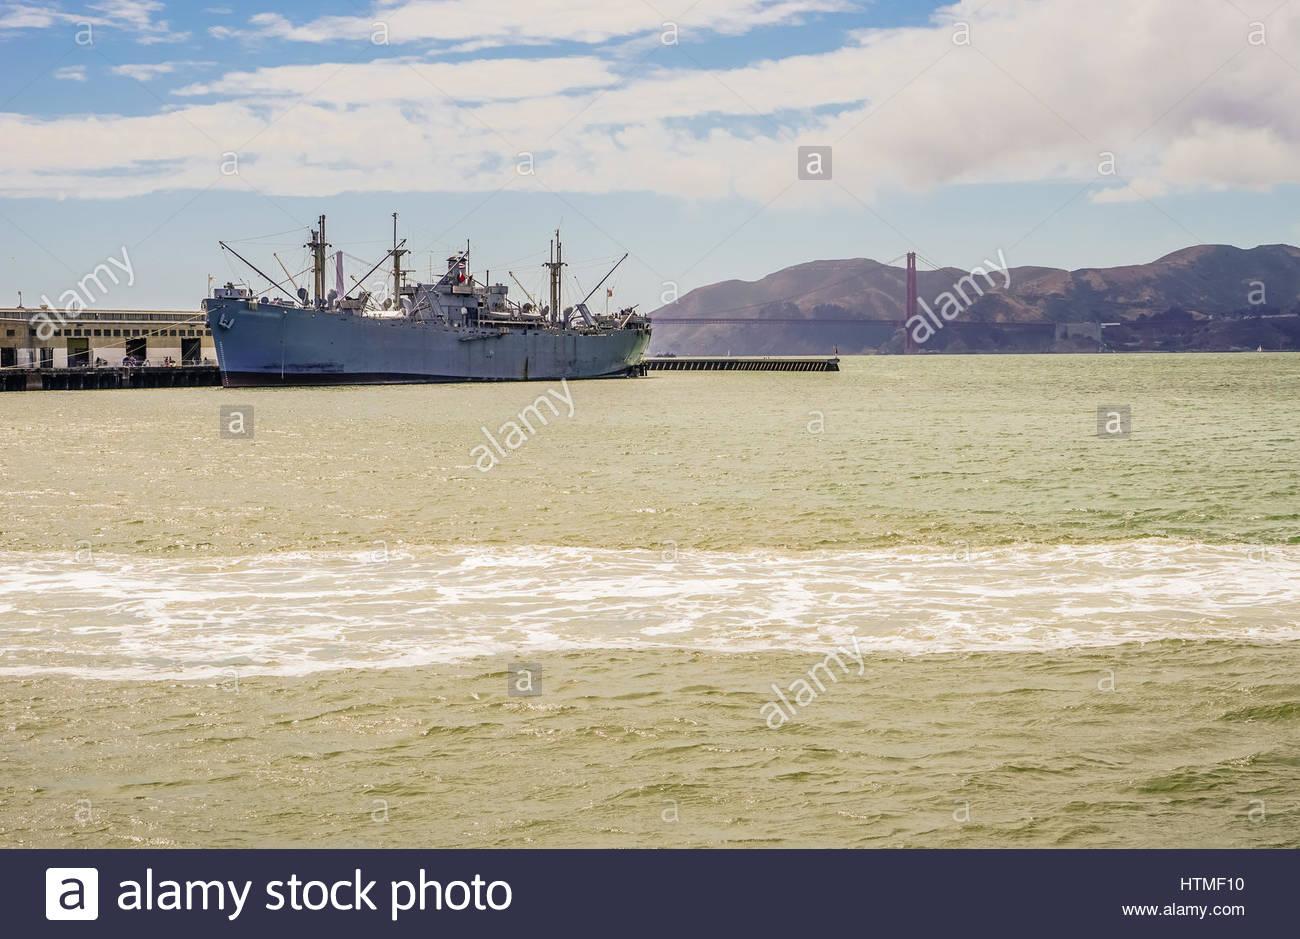 San Francisco Bay Pier 39 Wharf Forbes Island - Stock Image